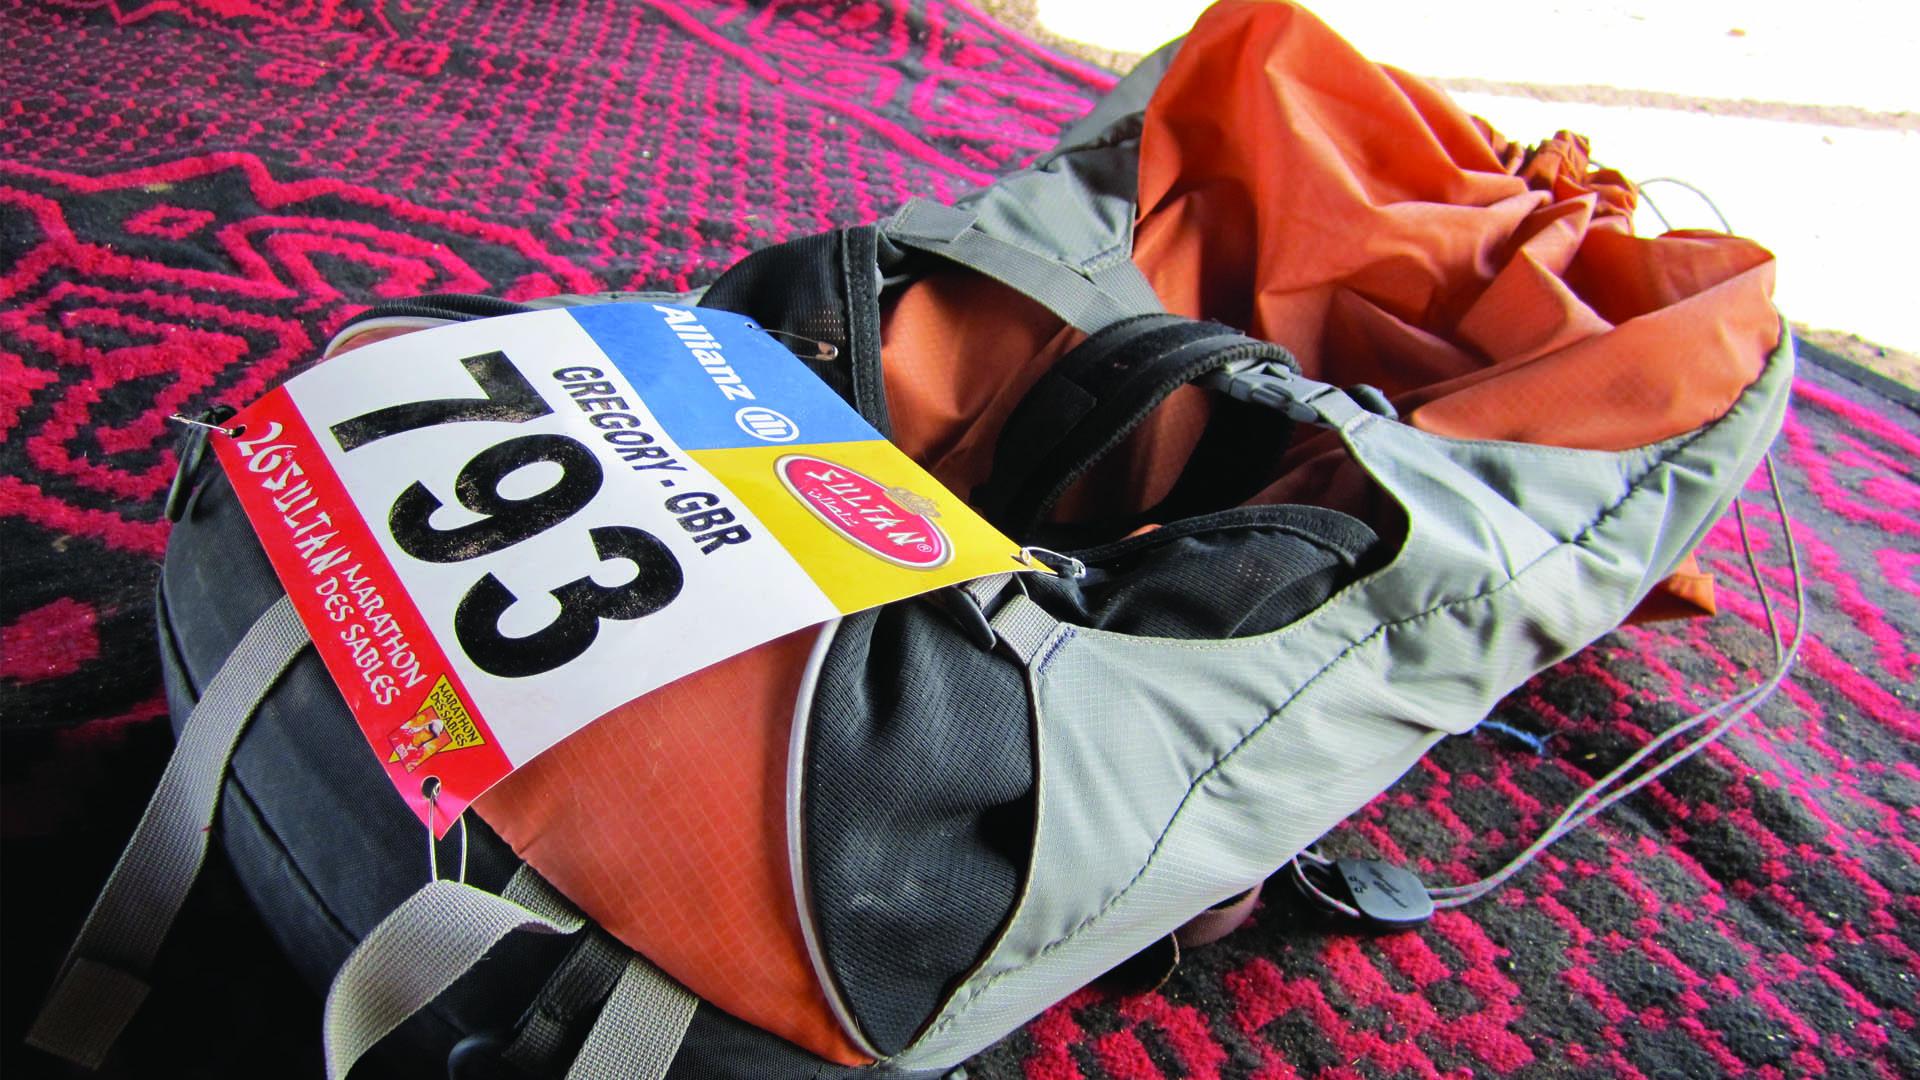 marathon-des-sables-running-bag